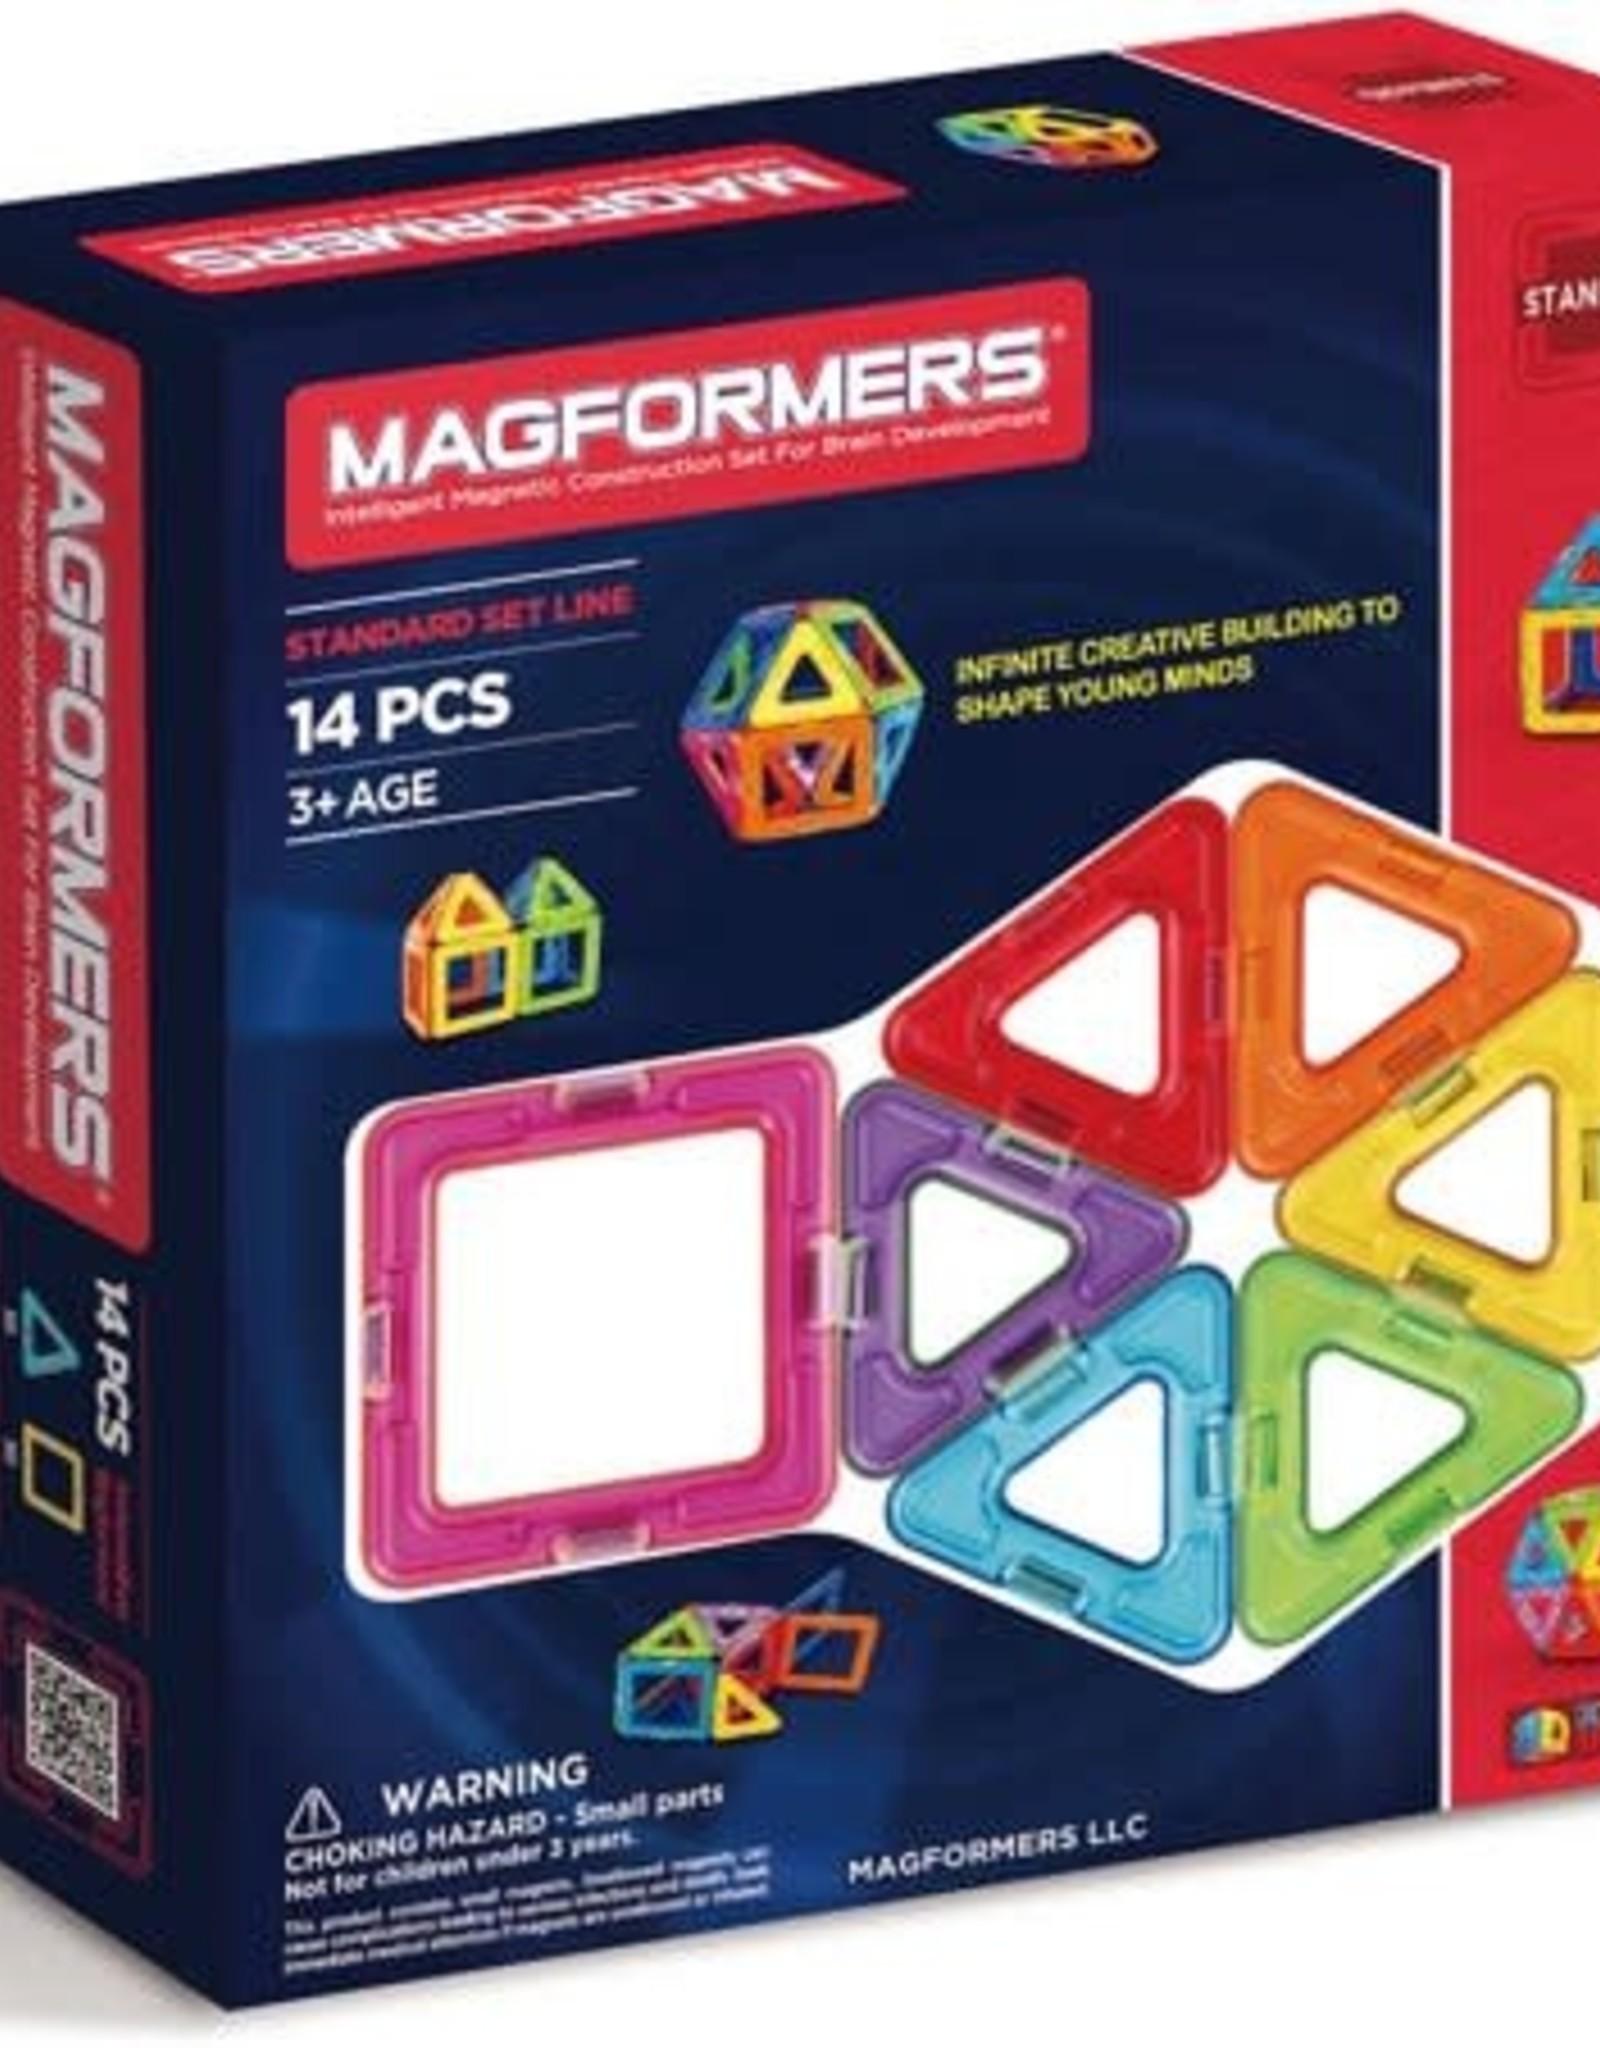 Magformer Rainbow basic 14pc set